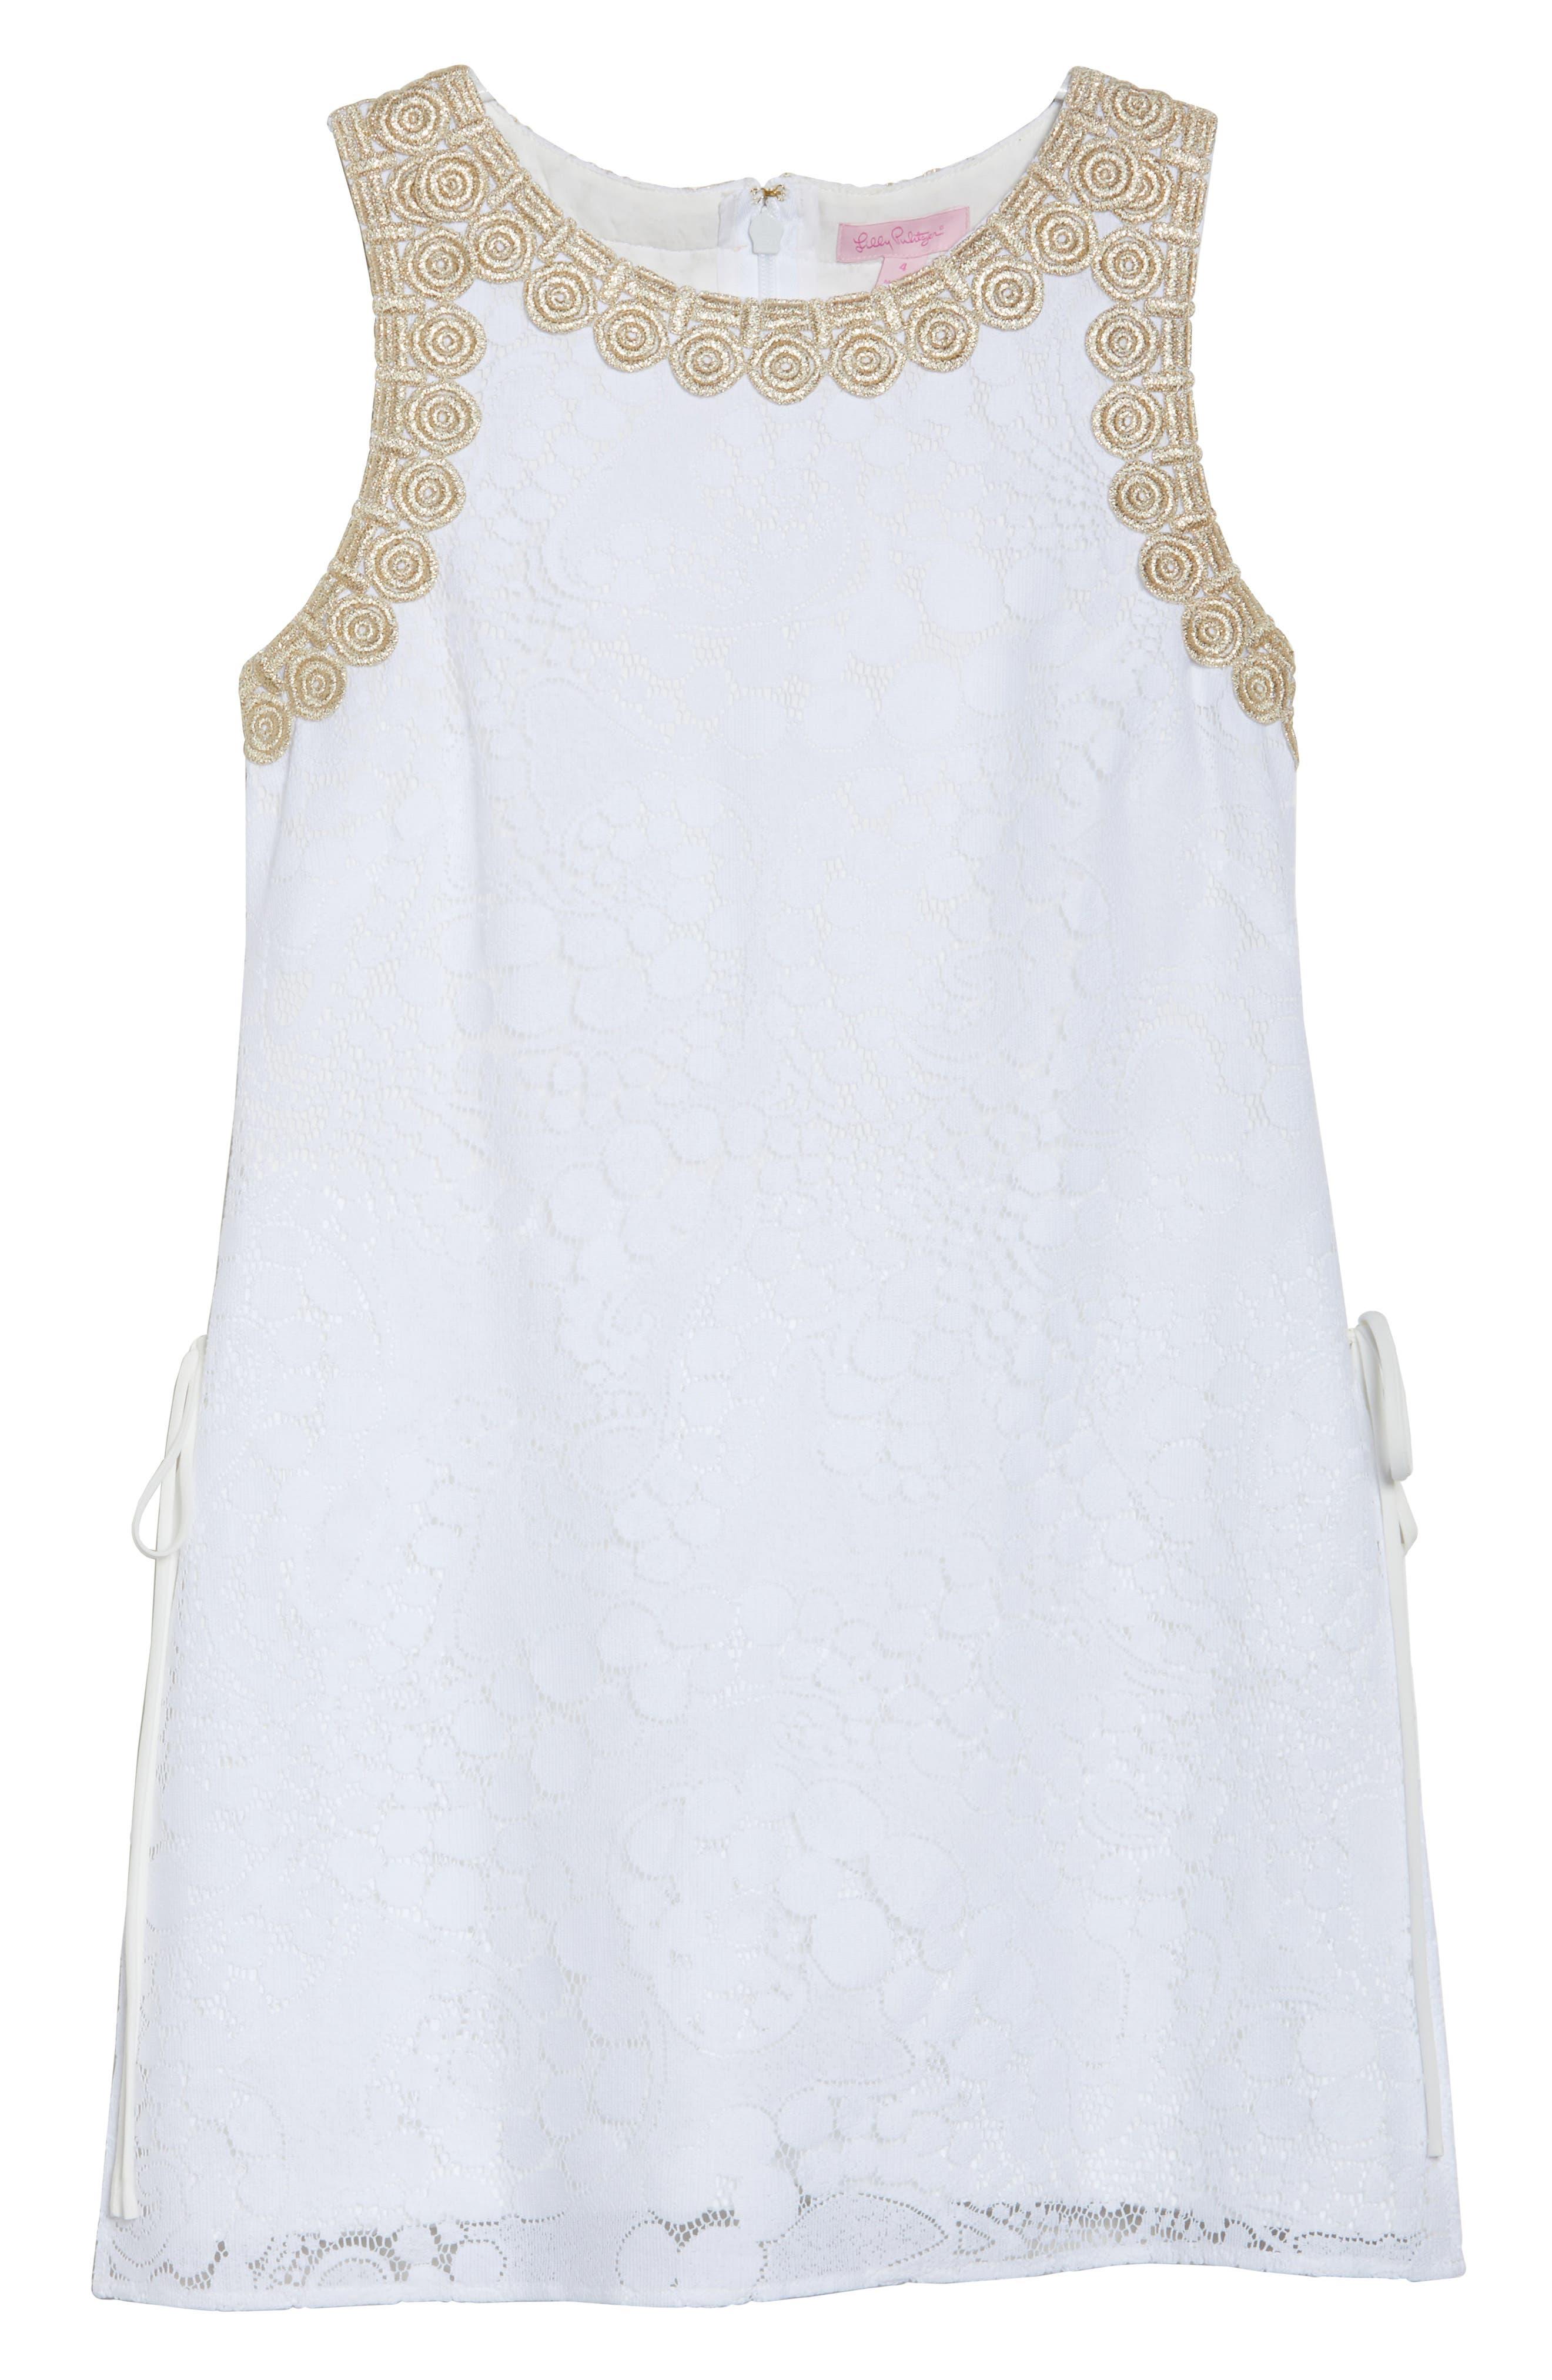 Donna Lace Romper,                             Alternate thumbnail 7, color,                             Resort White Mocean Lace